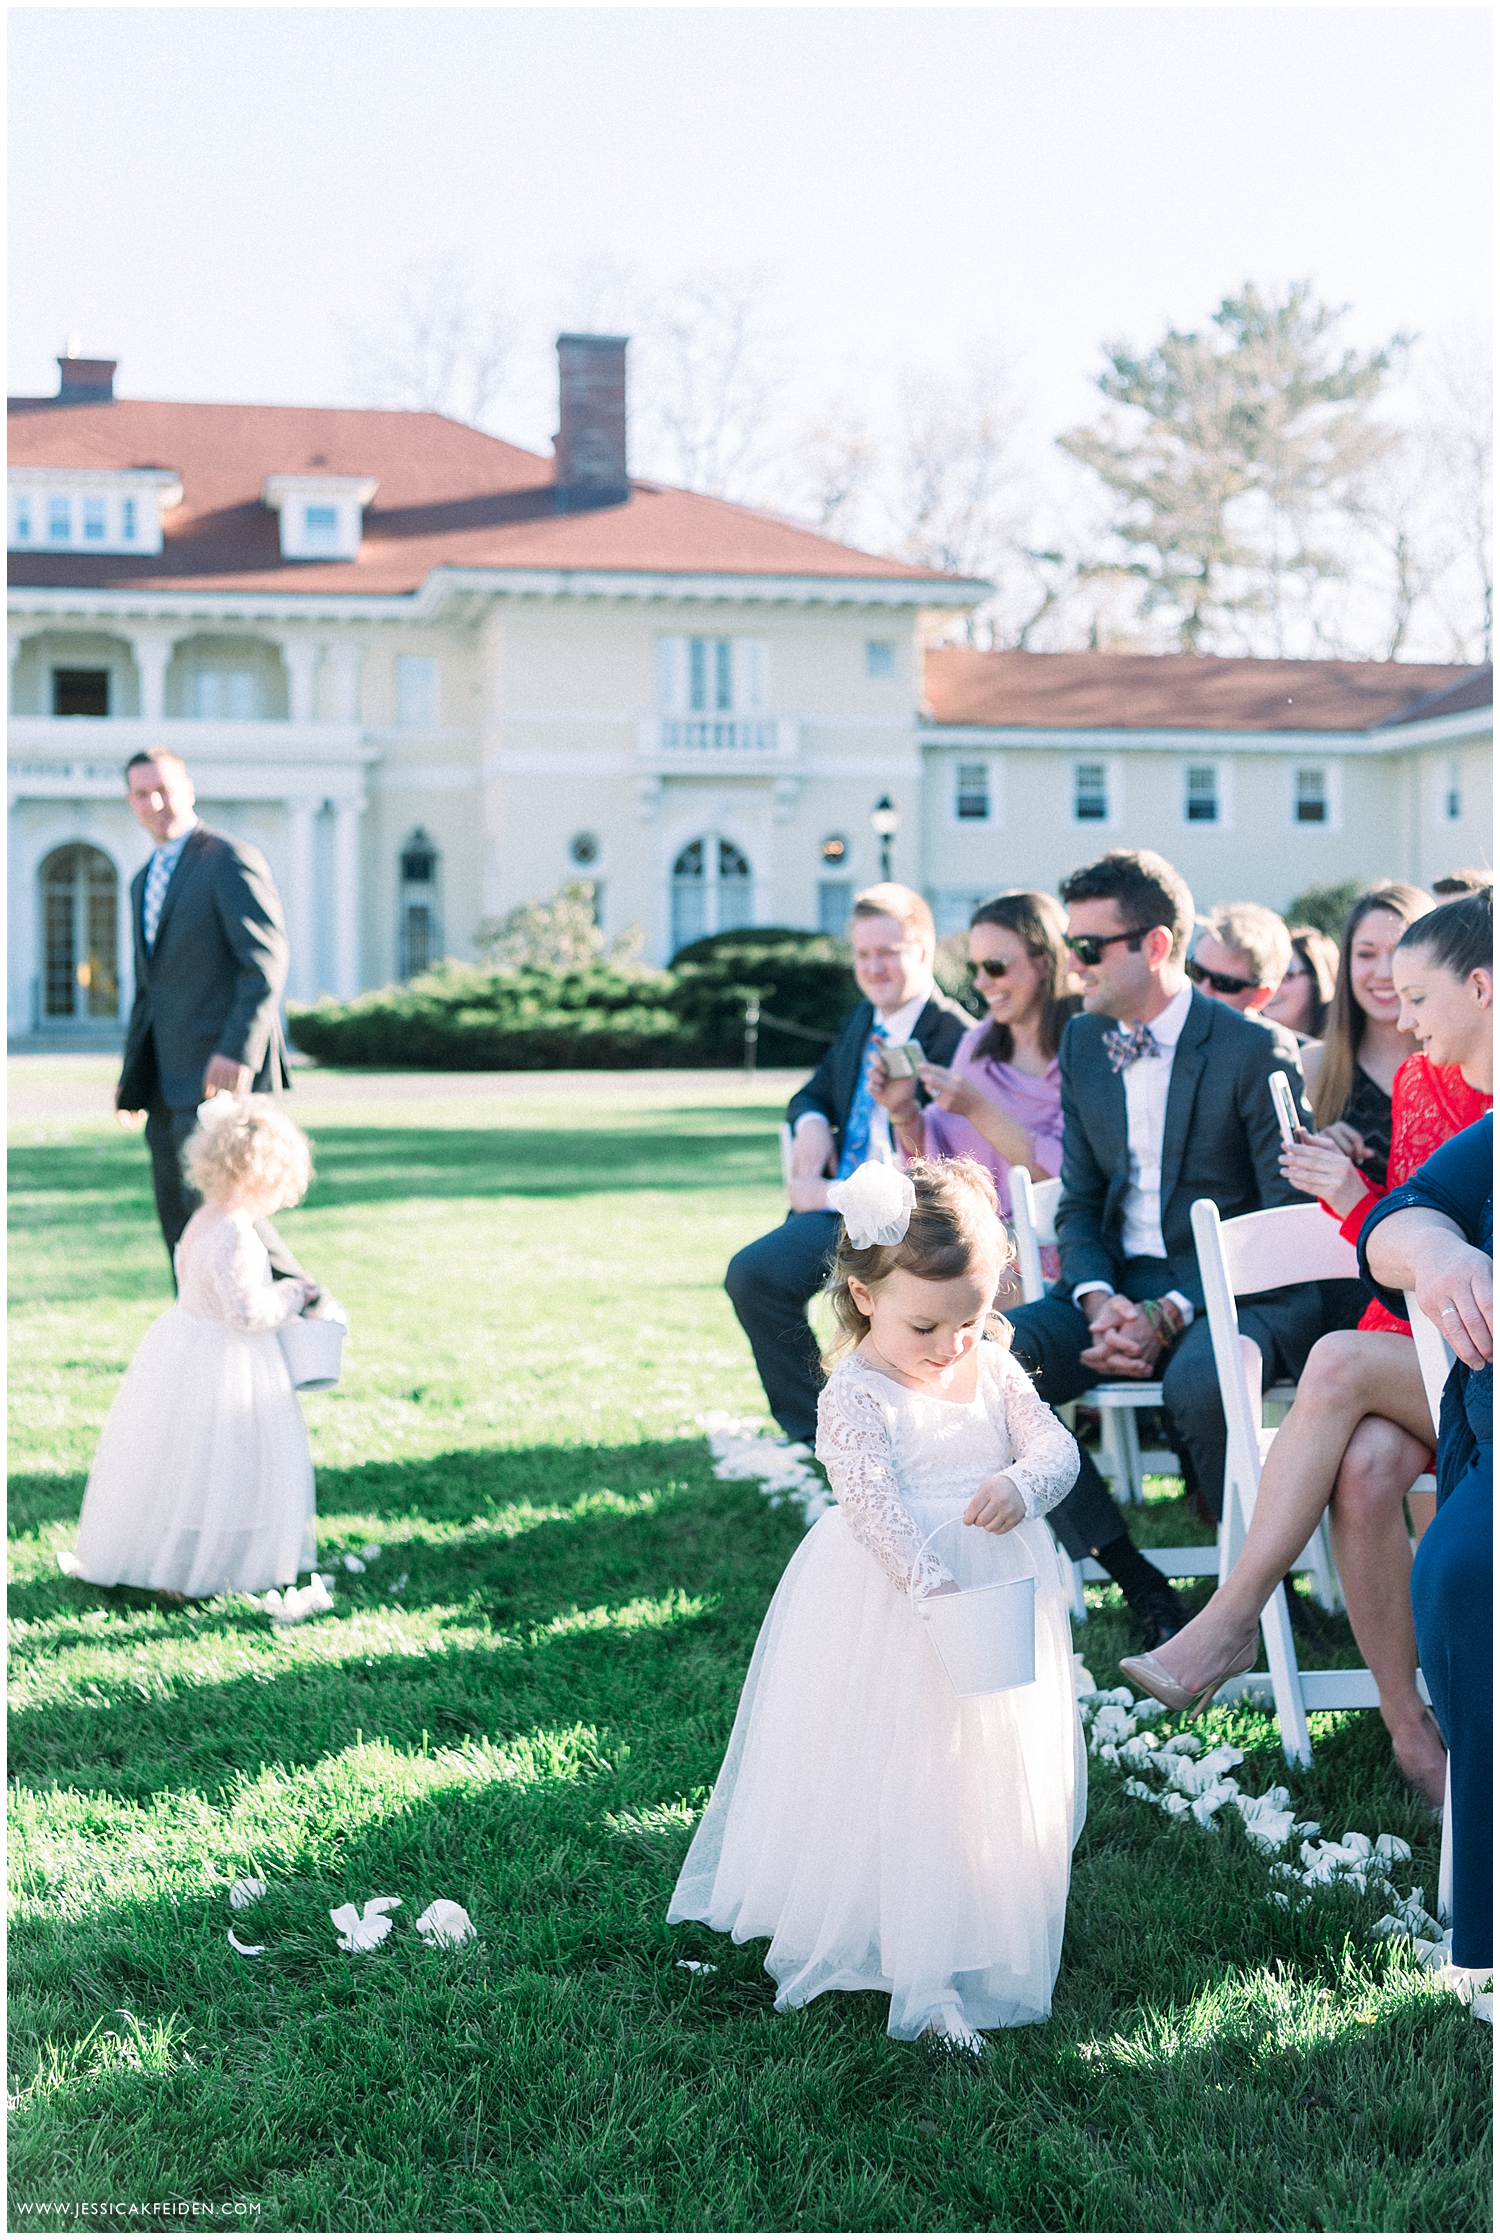 Jessica K Feiden Photography_Tupper Manor Beverly Wedding Photographer_0038.jpg